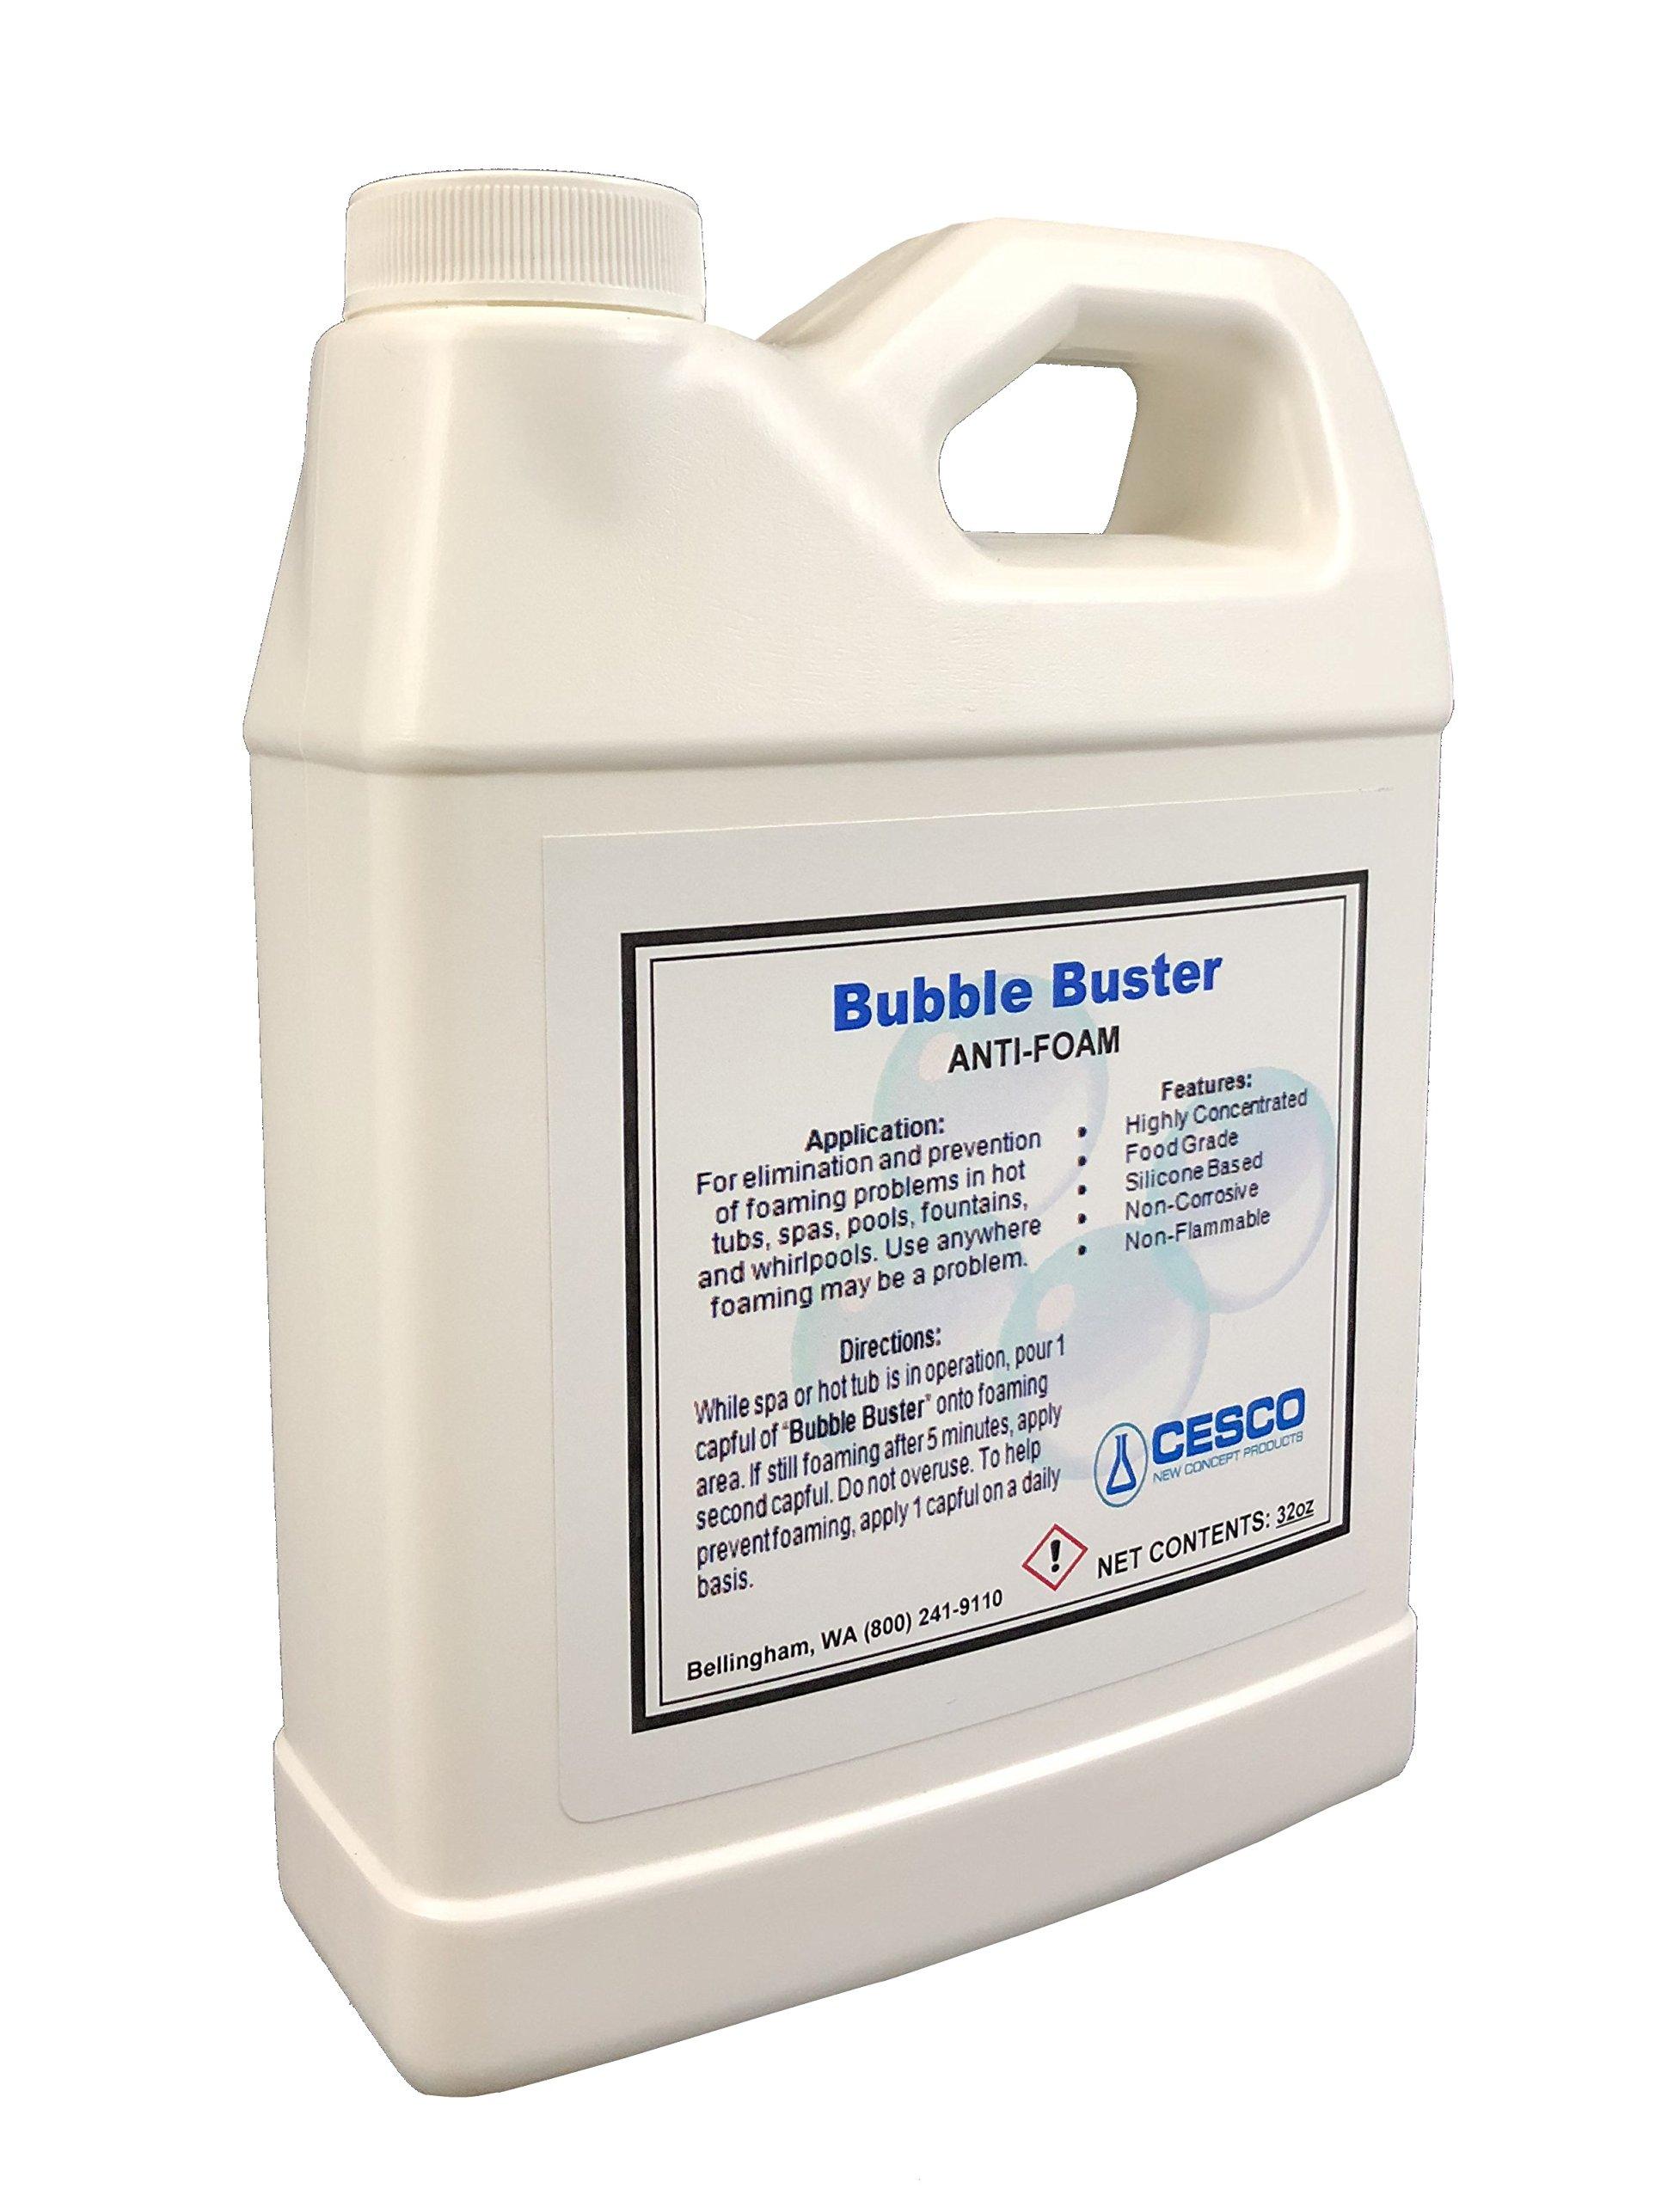 Cheap Hot Tub Insulation Foam, find Hot Tub Insulation Foam deals on ...